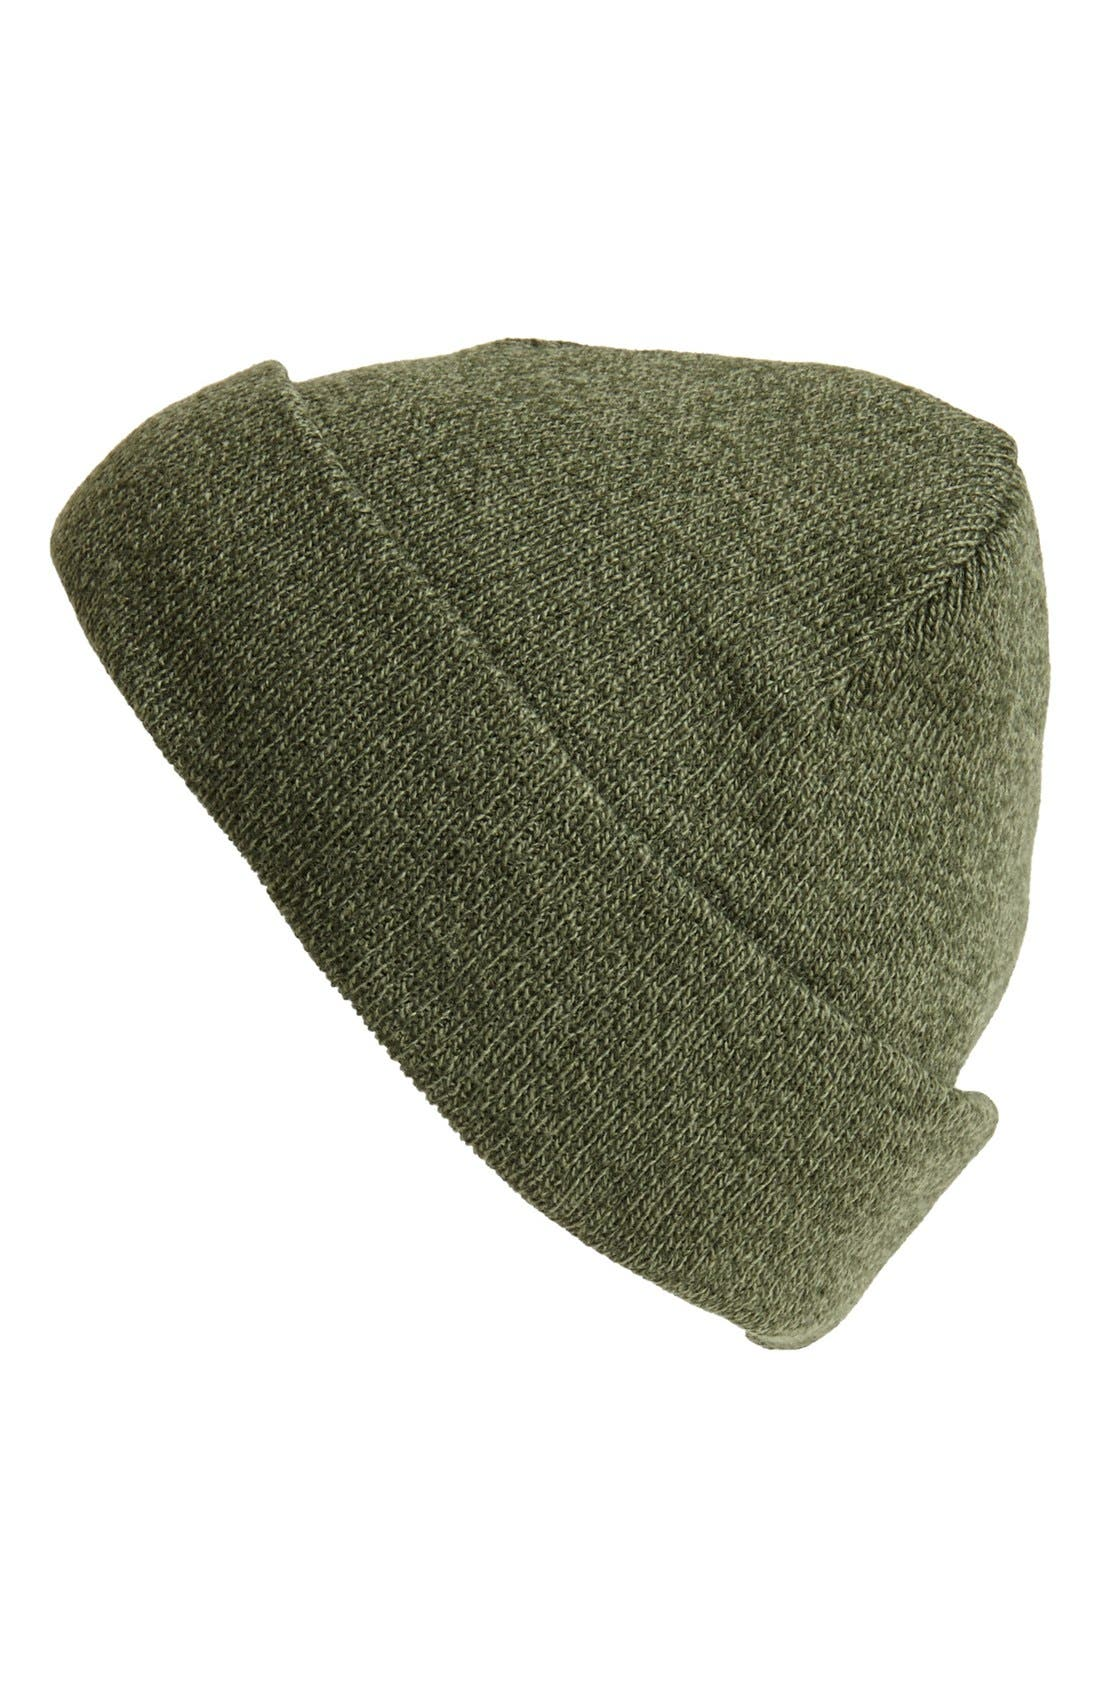 Alternate Image 1 Selected - Topman Knit Beanie